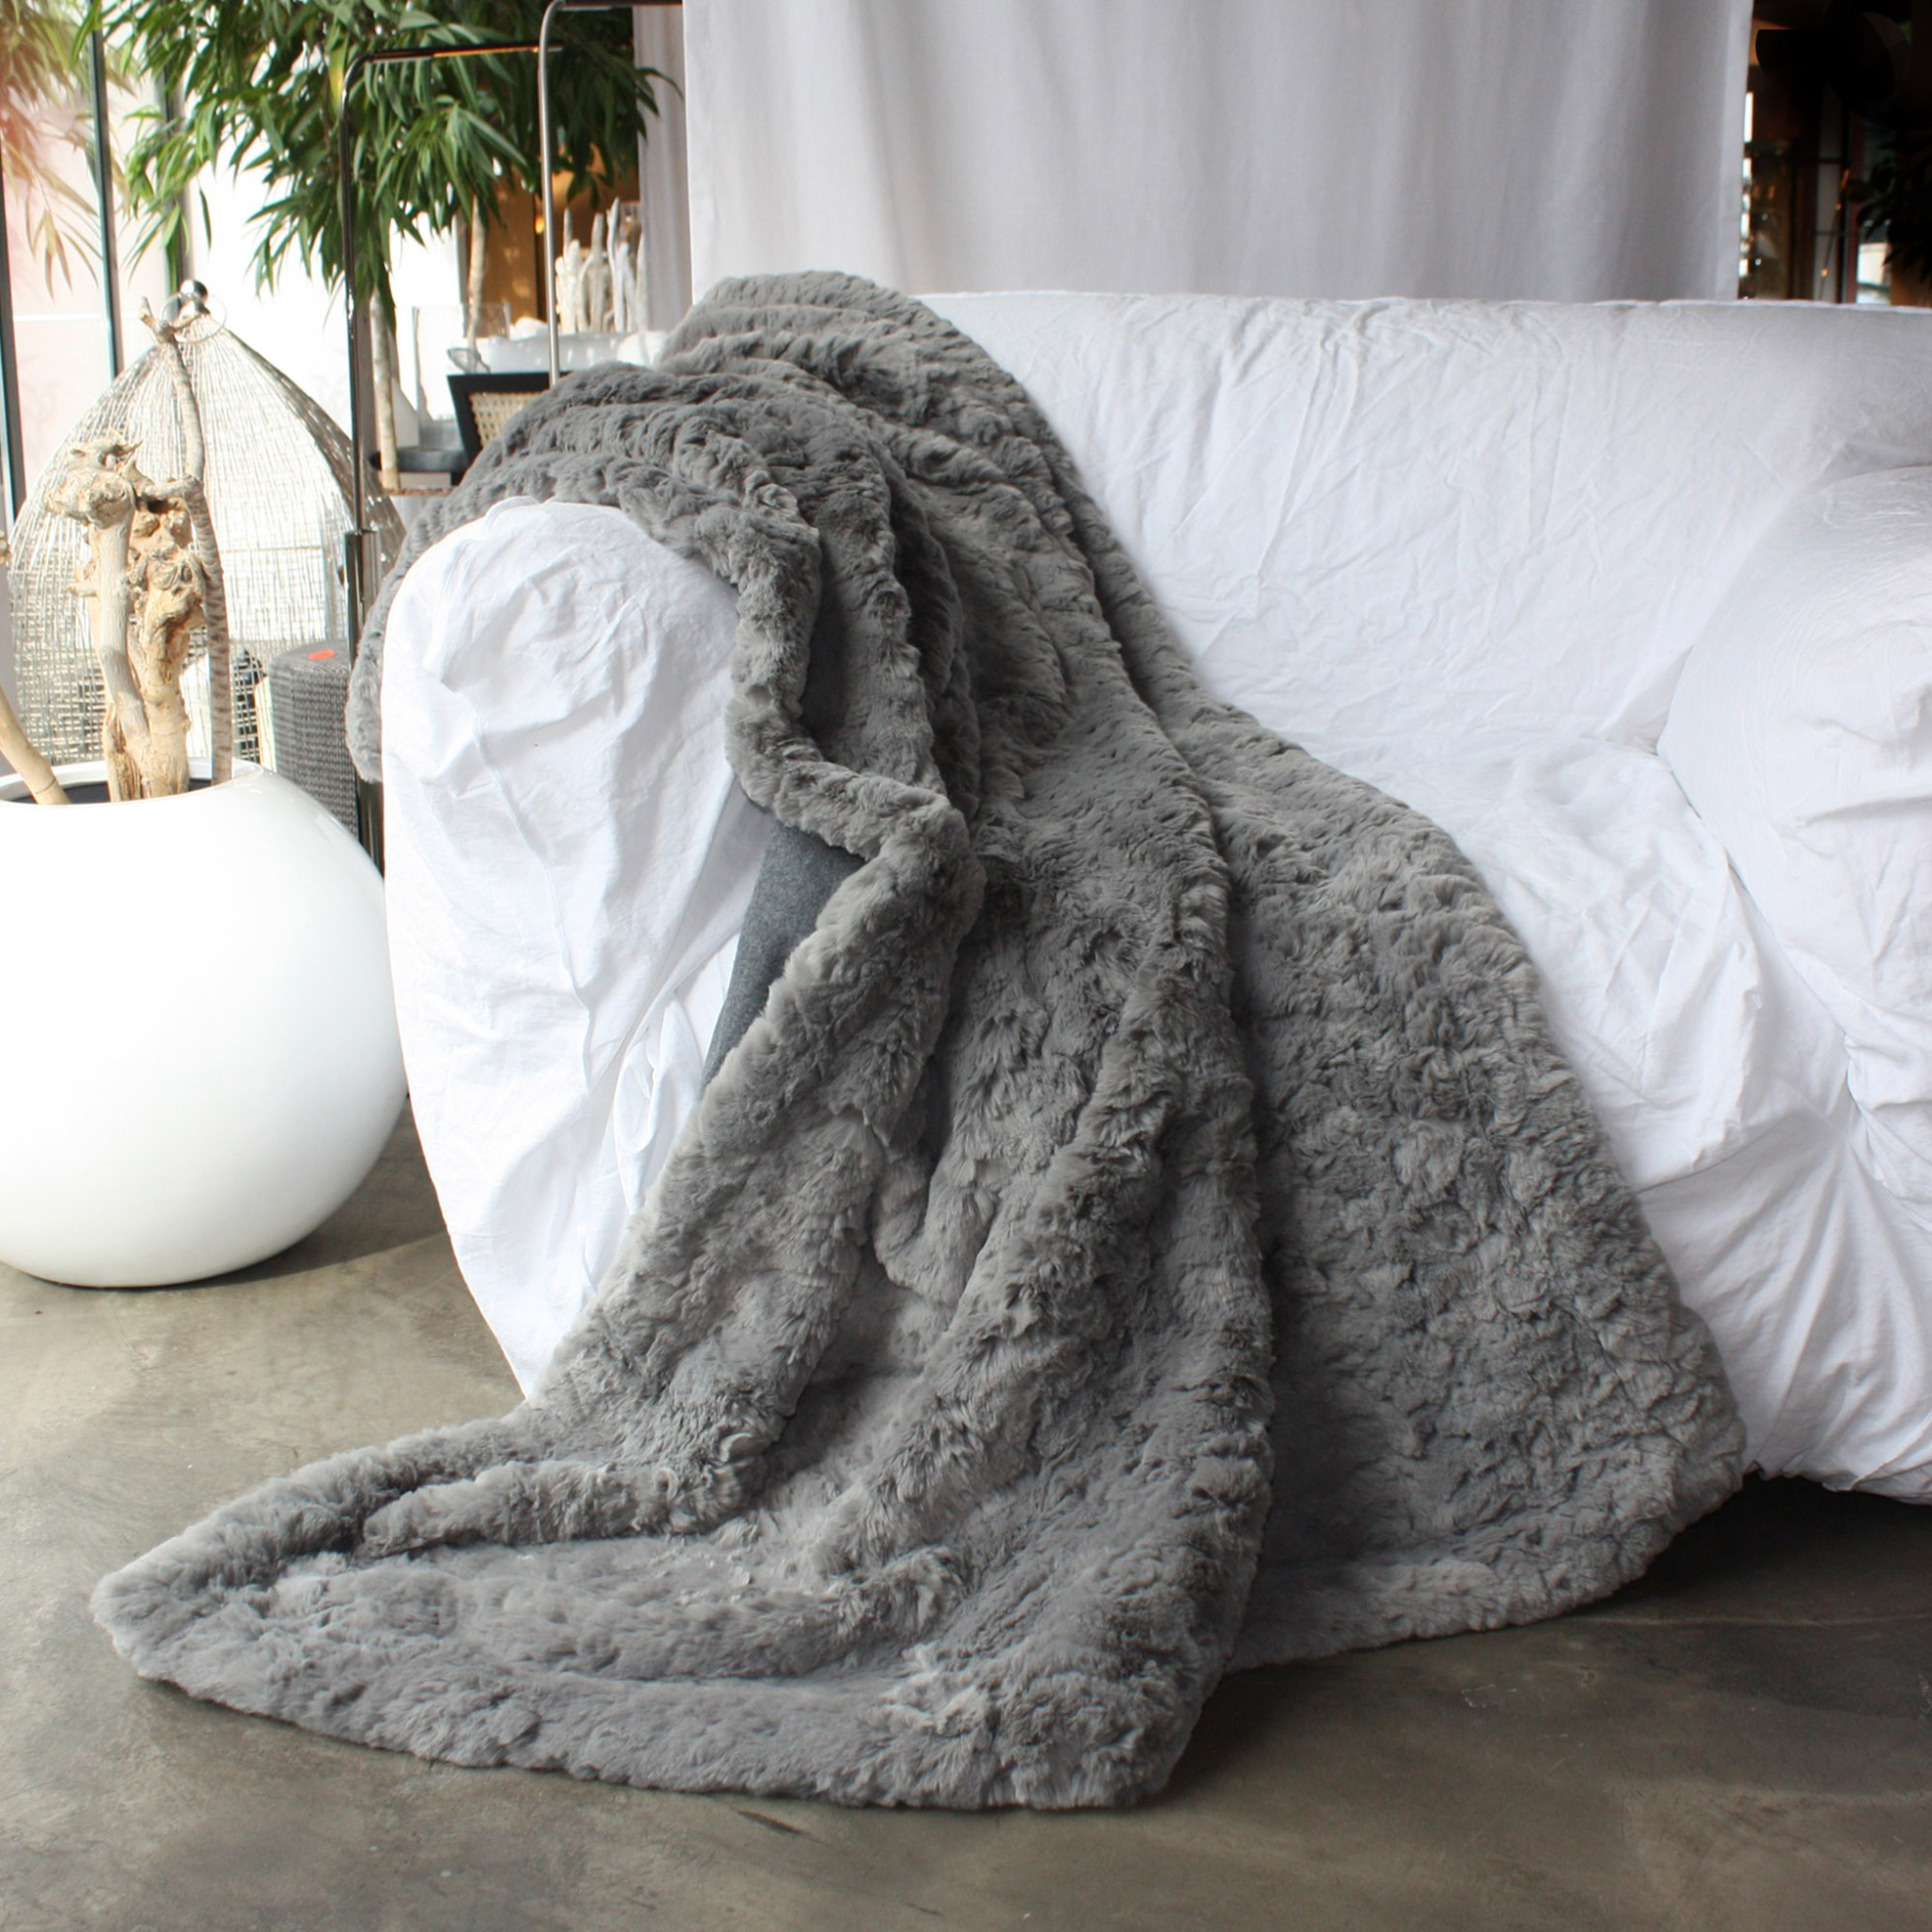 webpelz plaid kissen awassi grau von carma. Black Bedroom Furniture Sets. Home Design Ideas